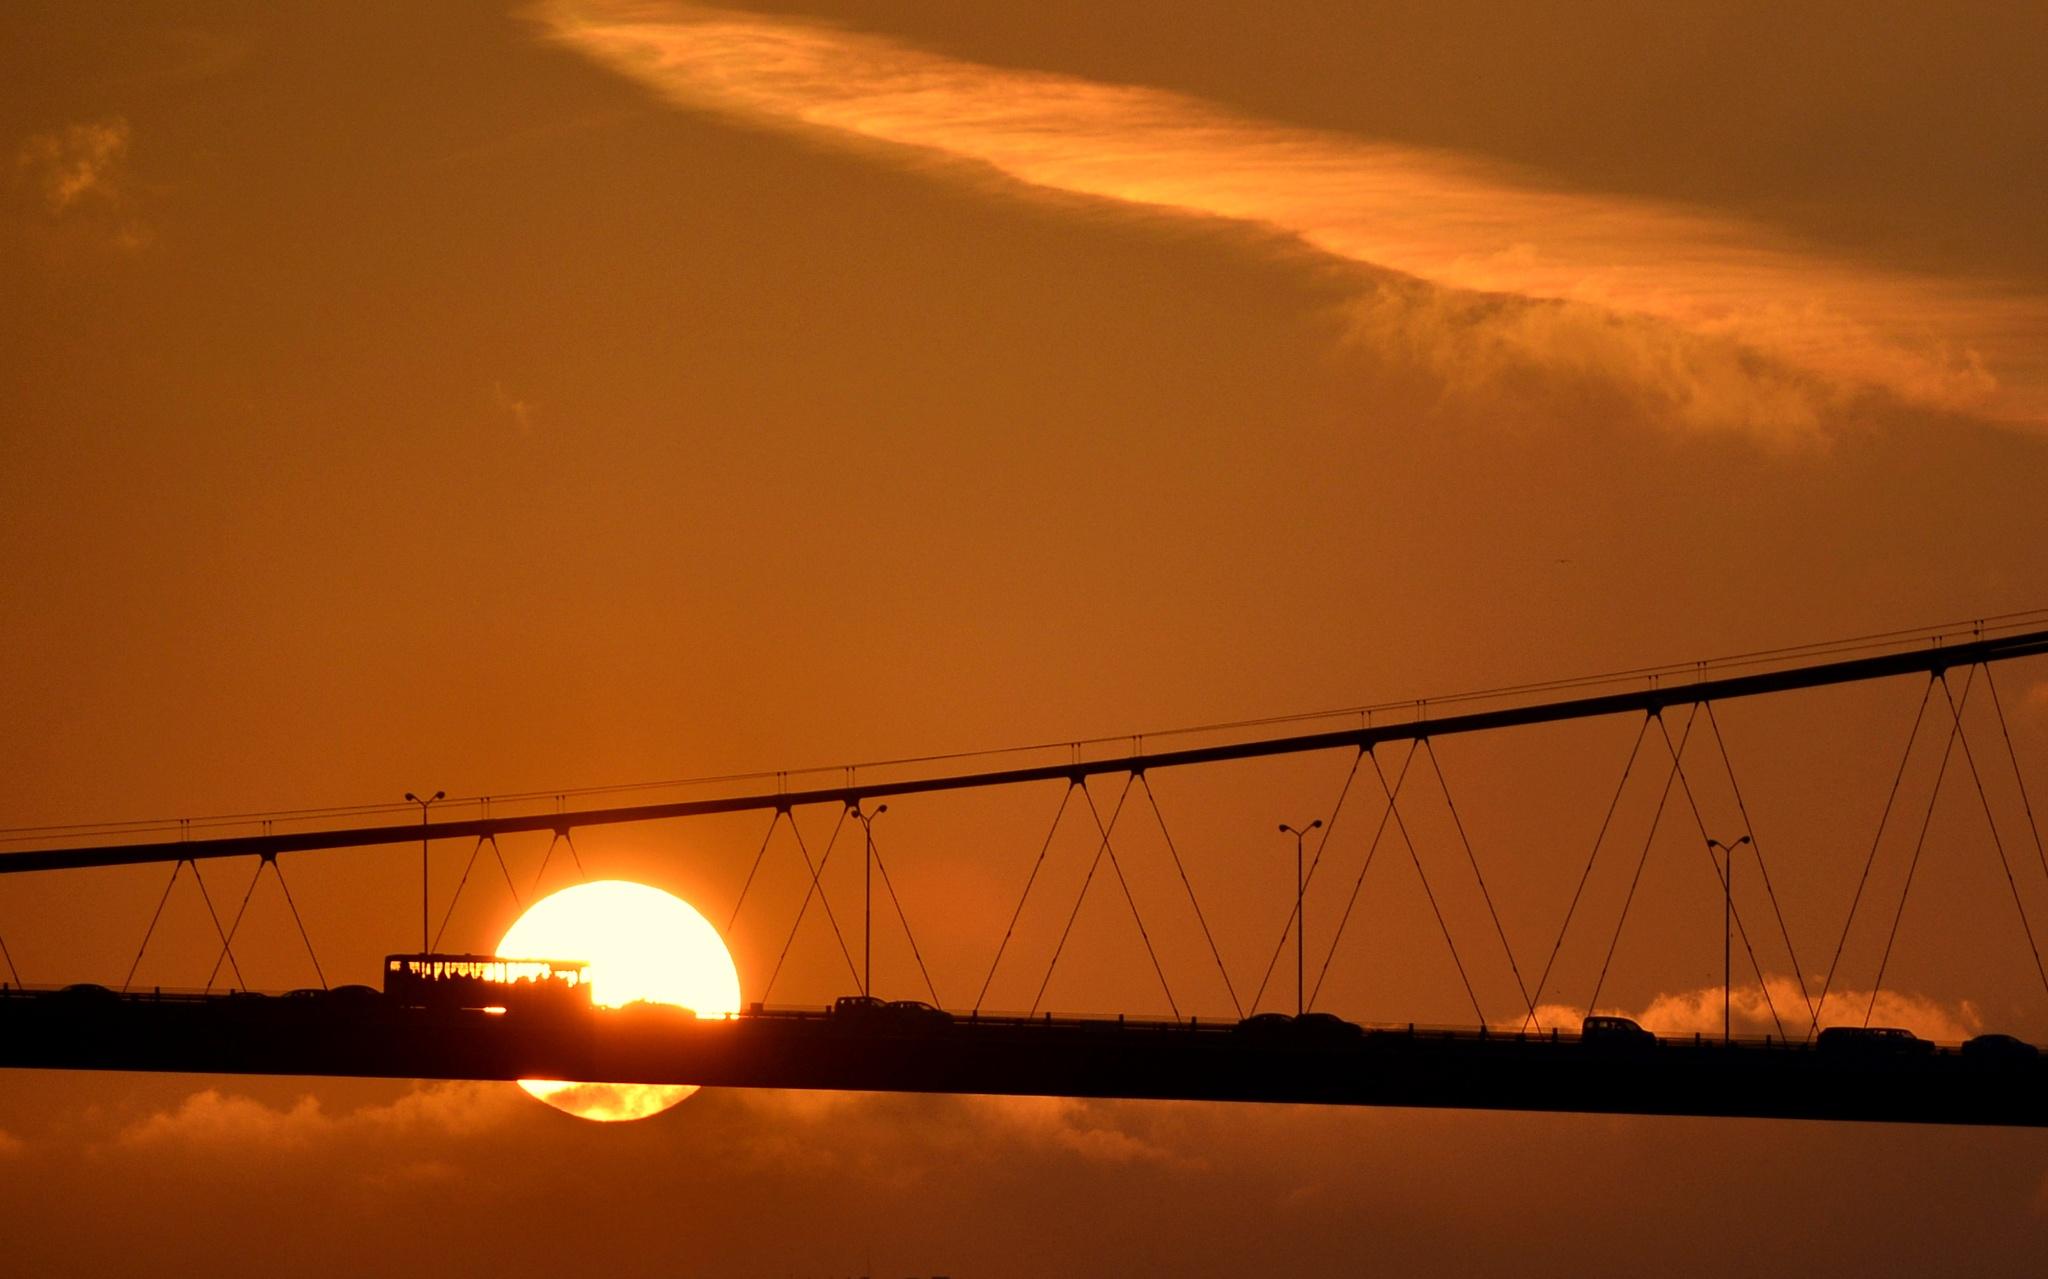 Way to sun by vabserk